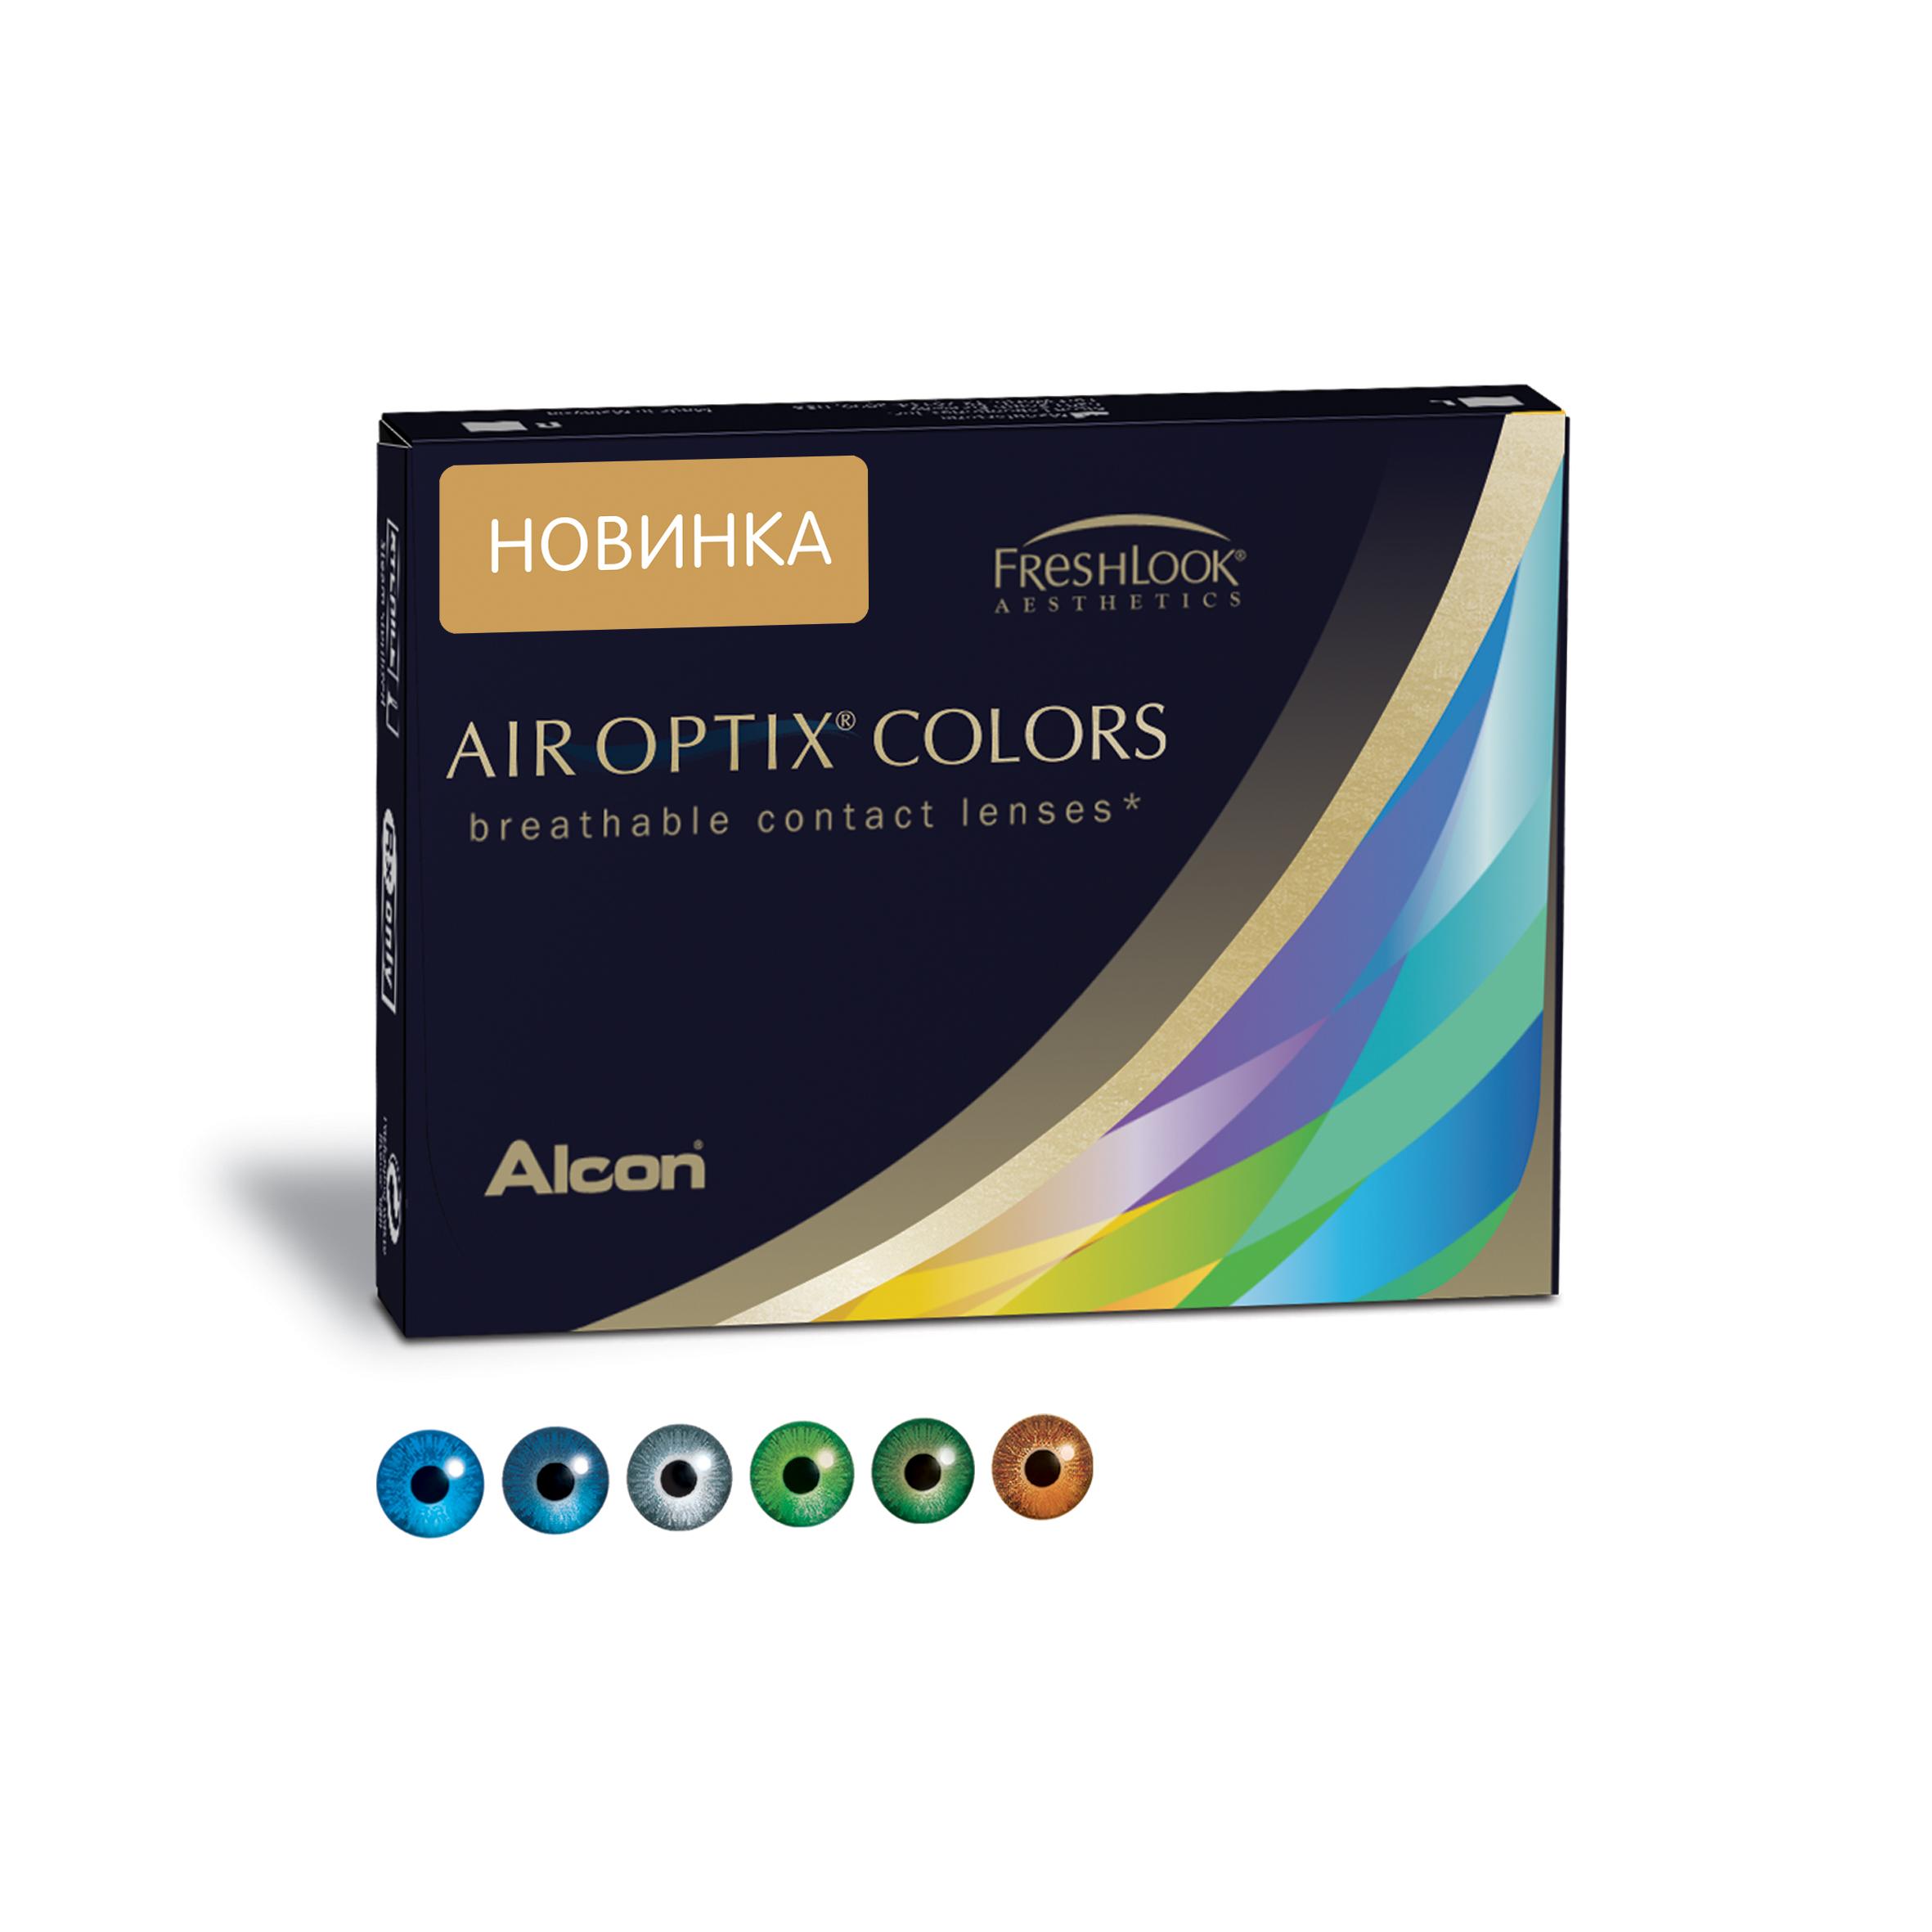 Аlcon контактные линзы Air Optix Colors 2 шт -7.00 Gemstone Green31746322Мягкие контактные линзы